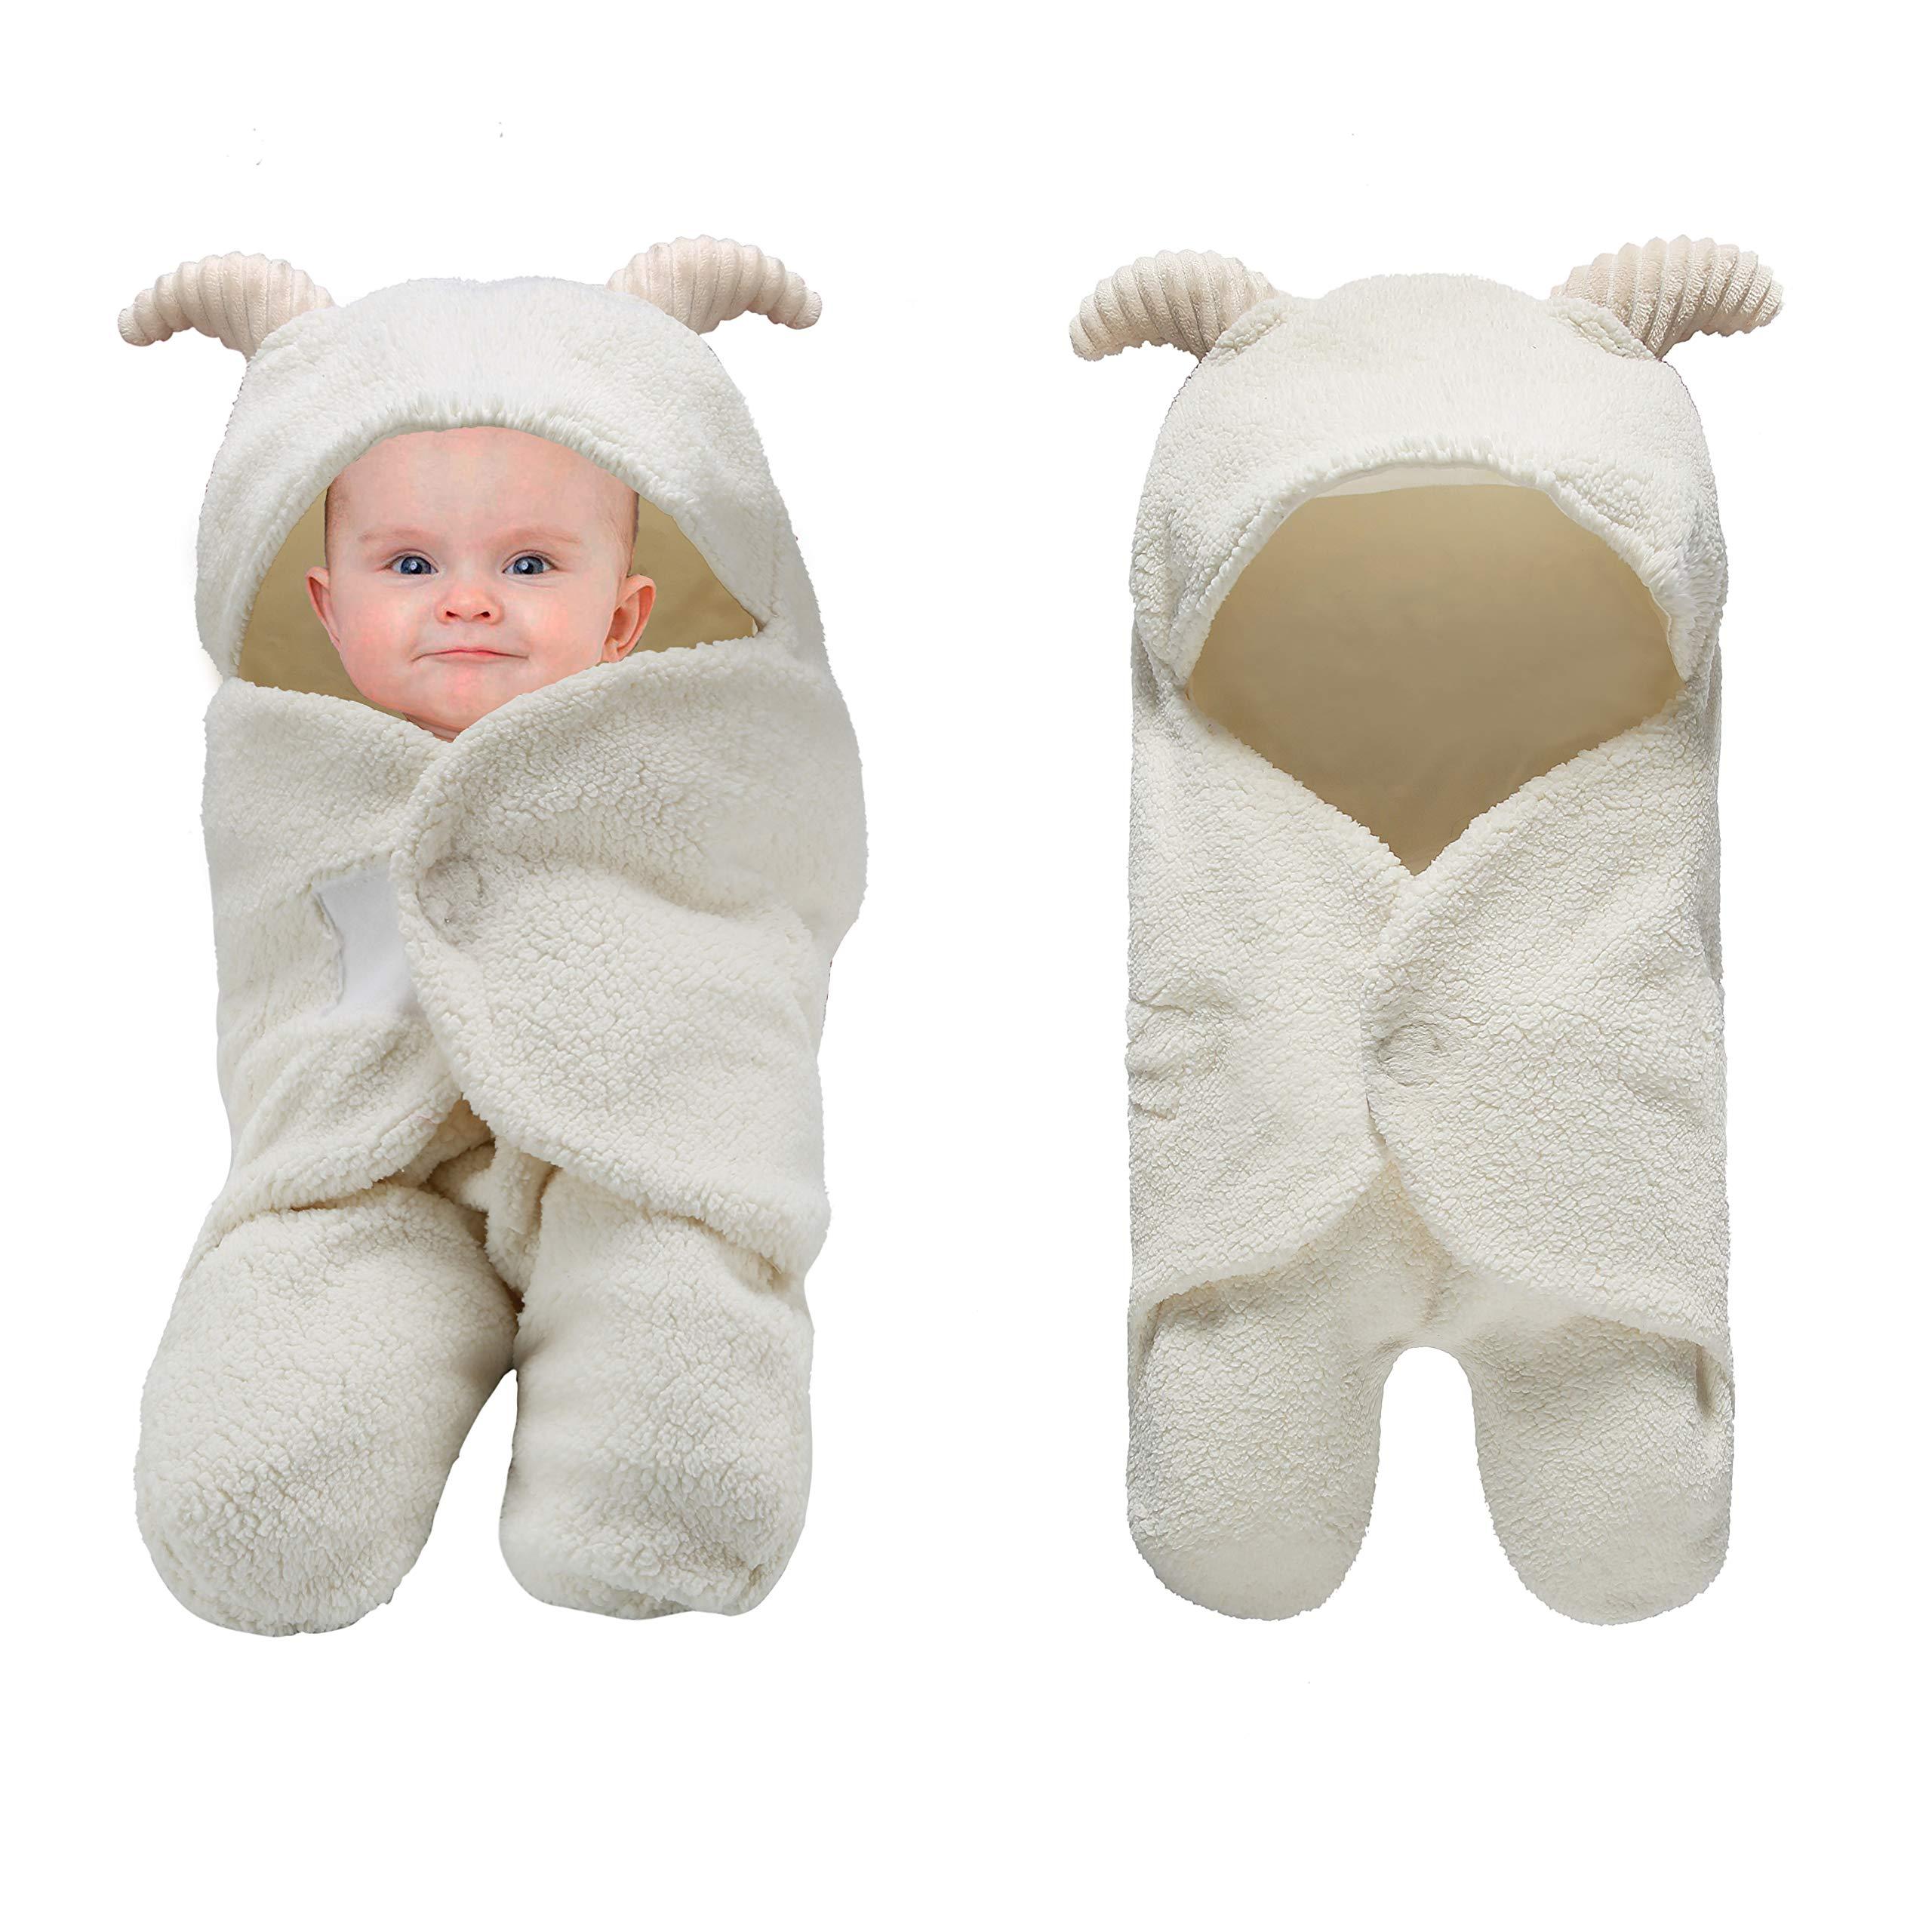 Pro Goleem Unisex Baby Swaddle Blanket White Ultra-Soft 0-6 Month Receiving Wrap Shower Gift